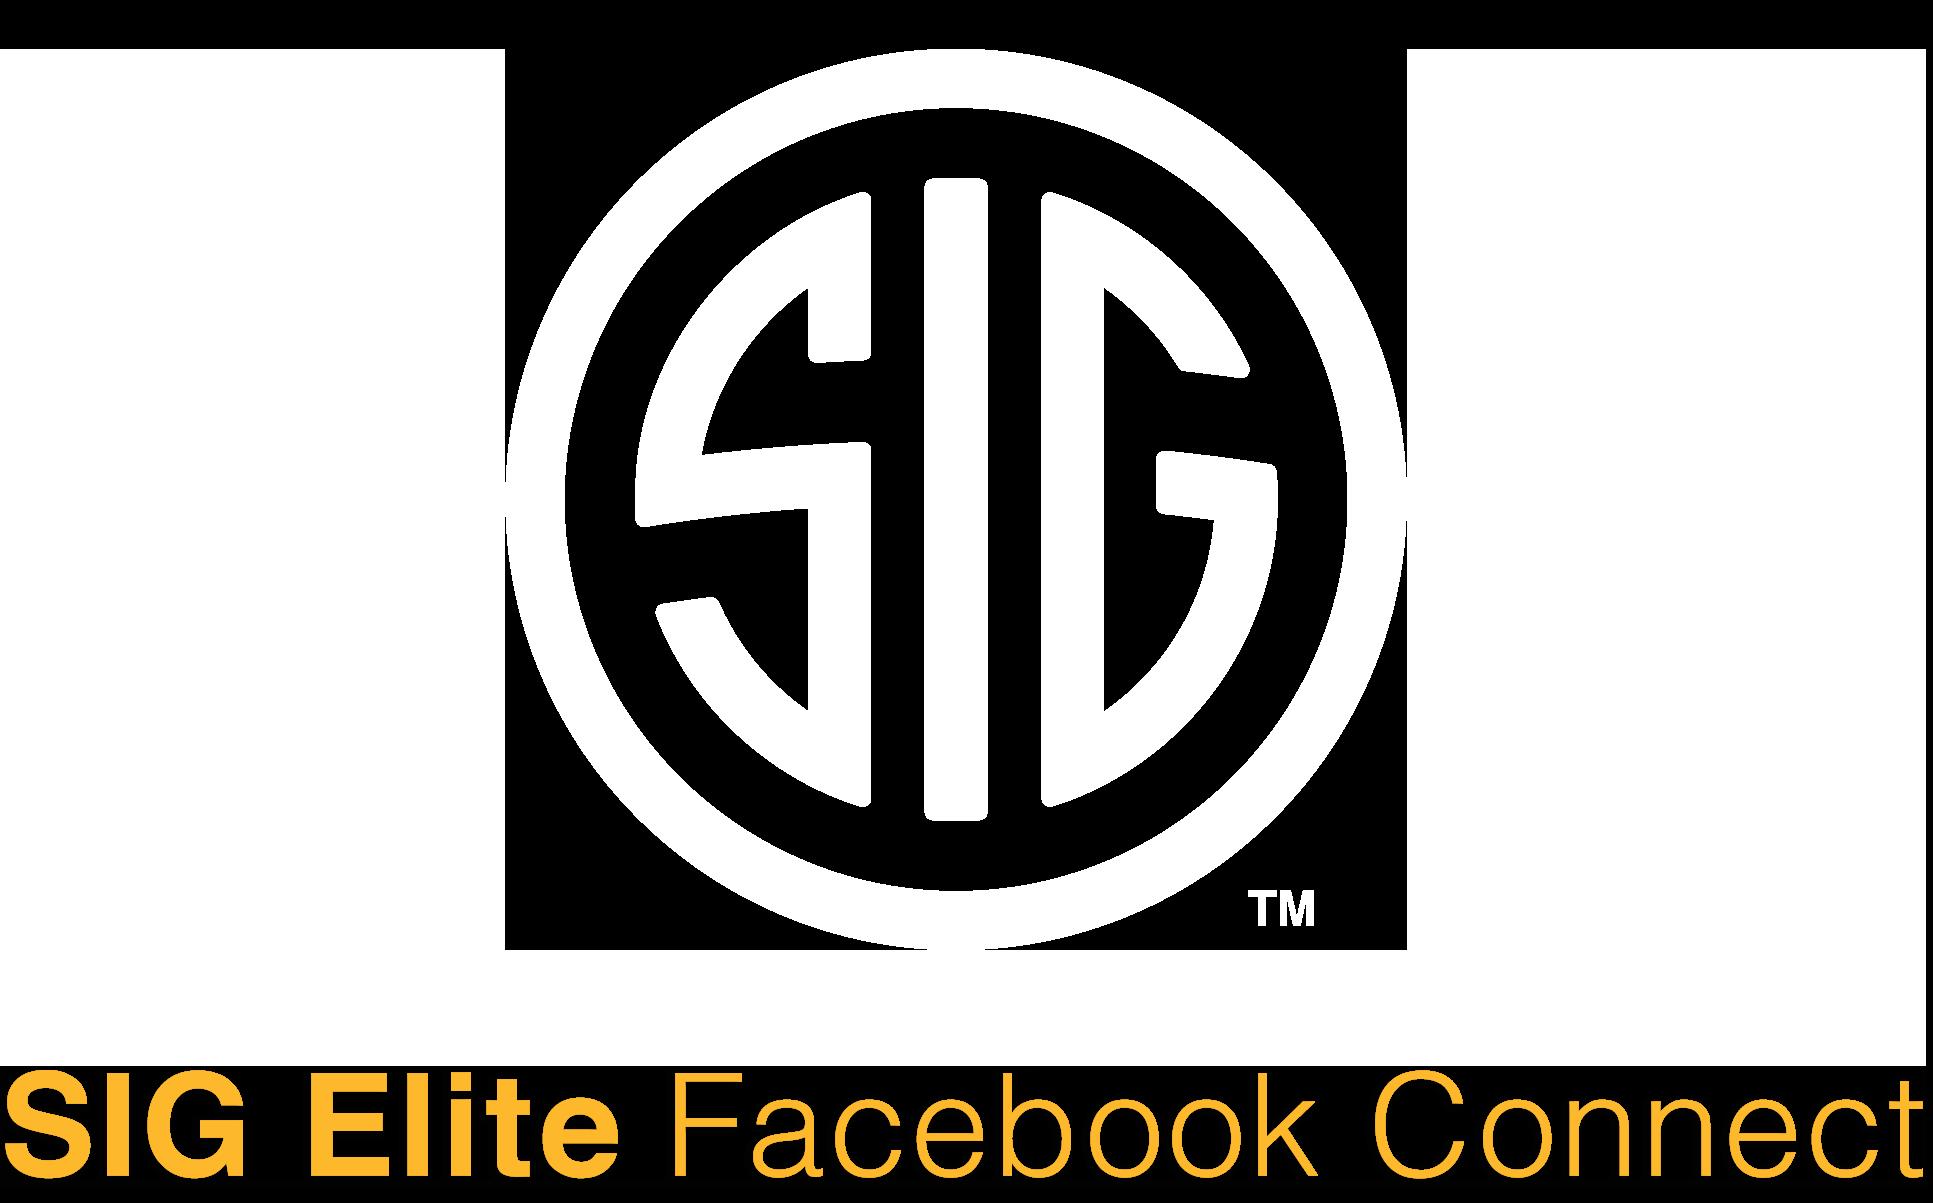 ss-white-emblem-10-18.png